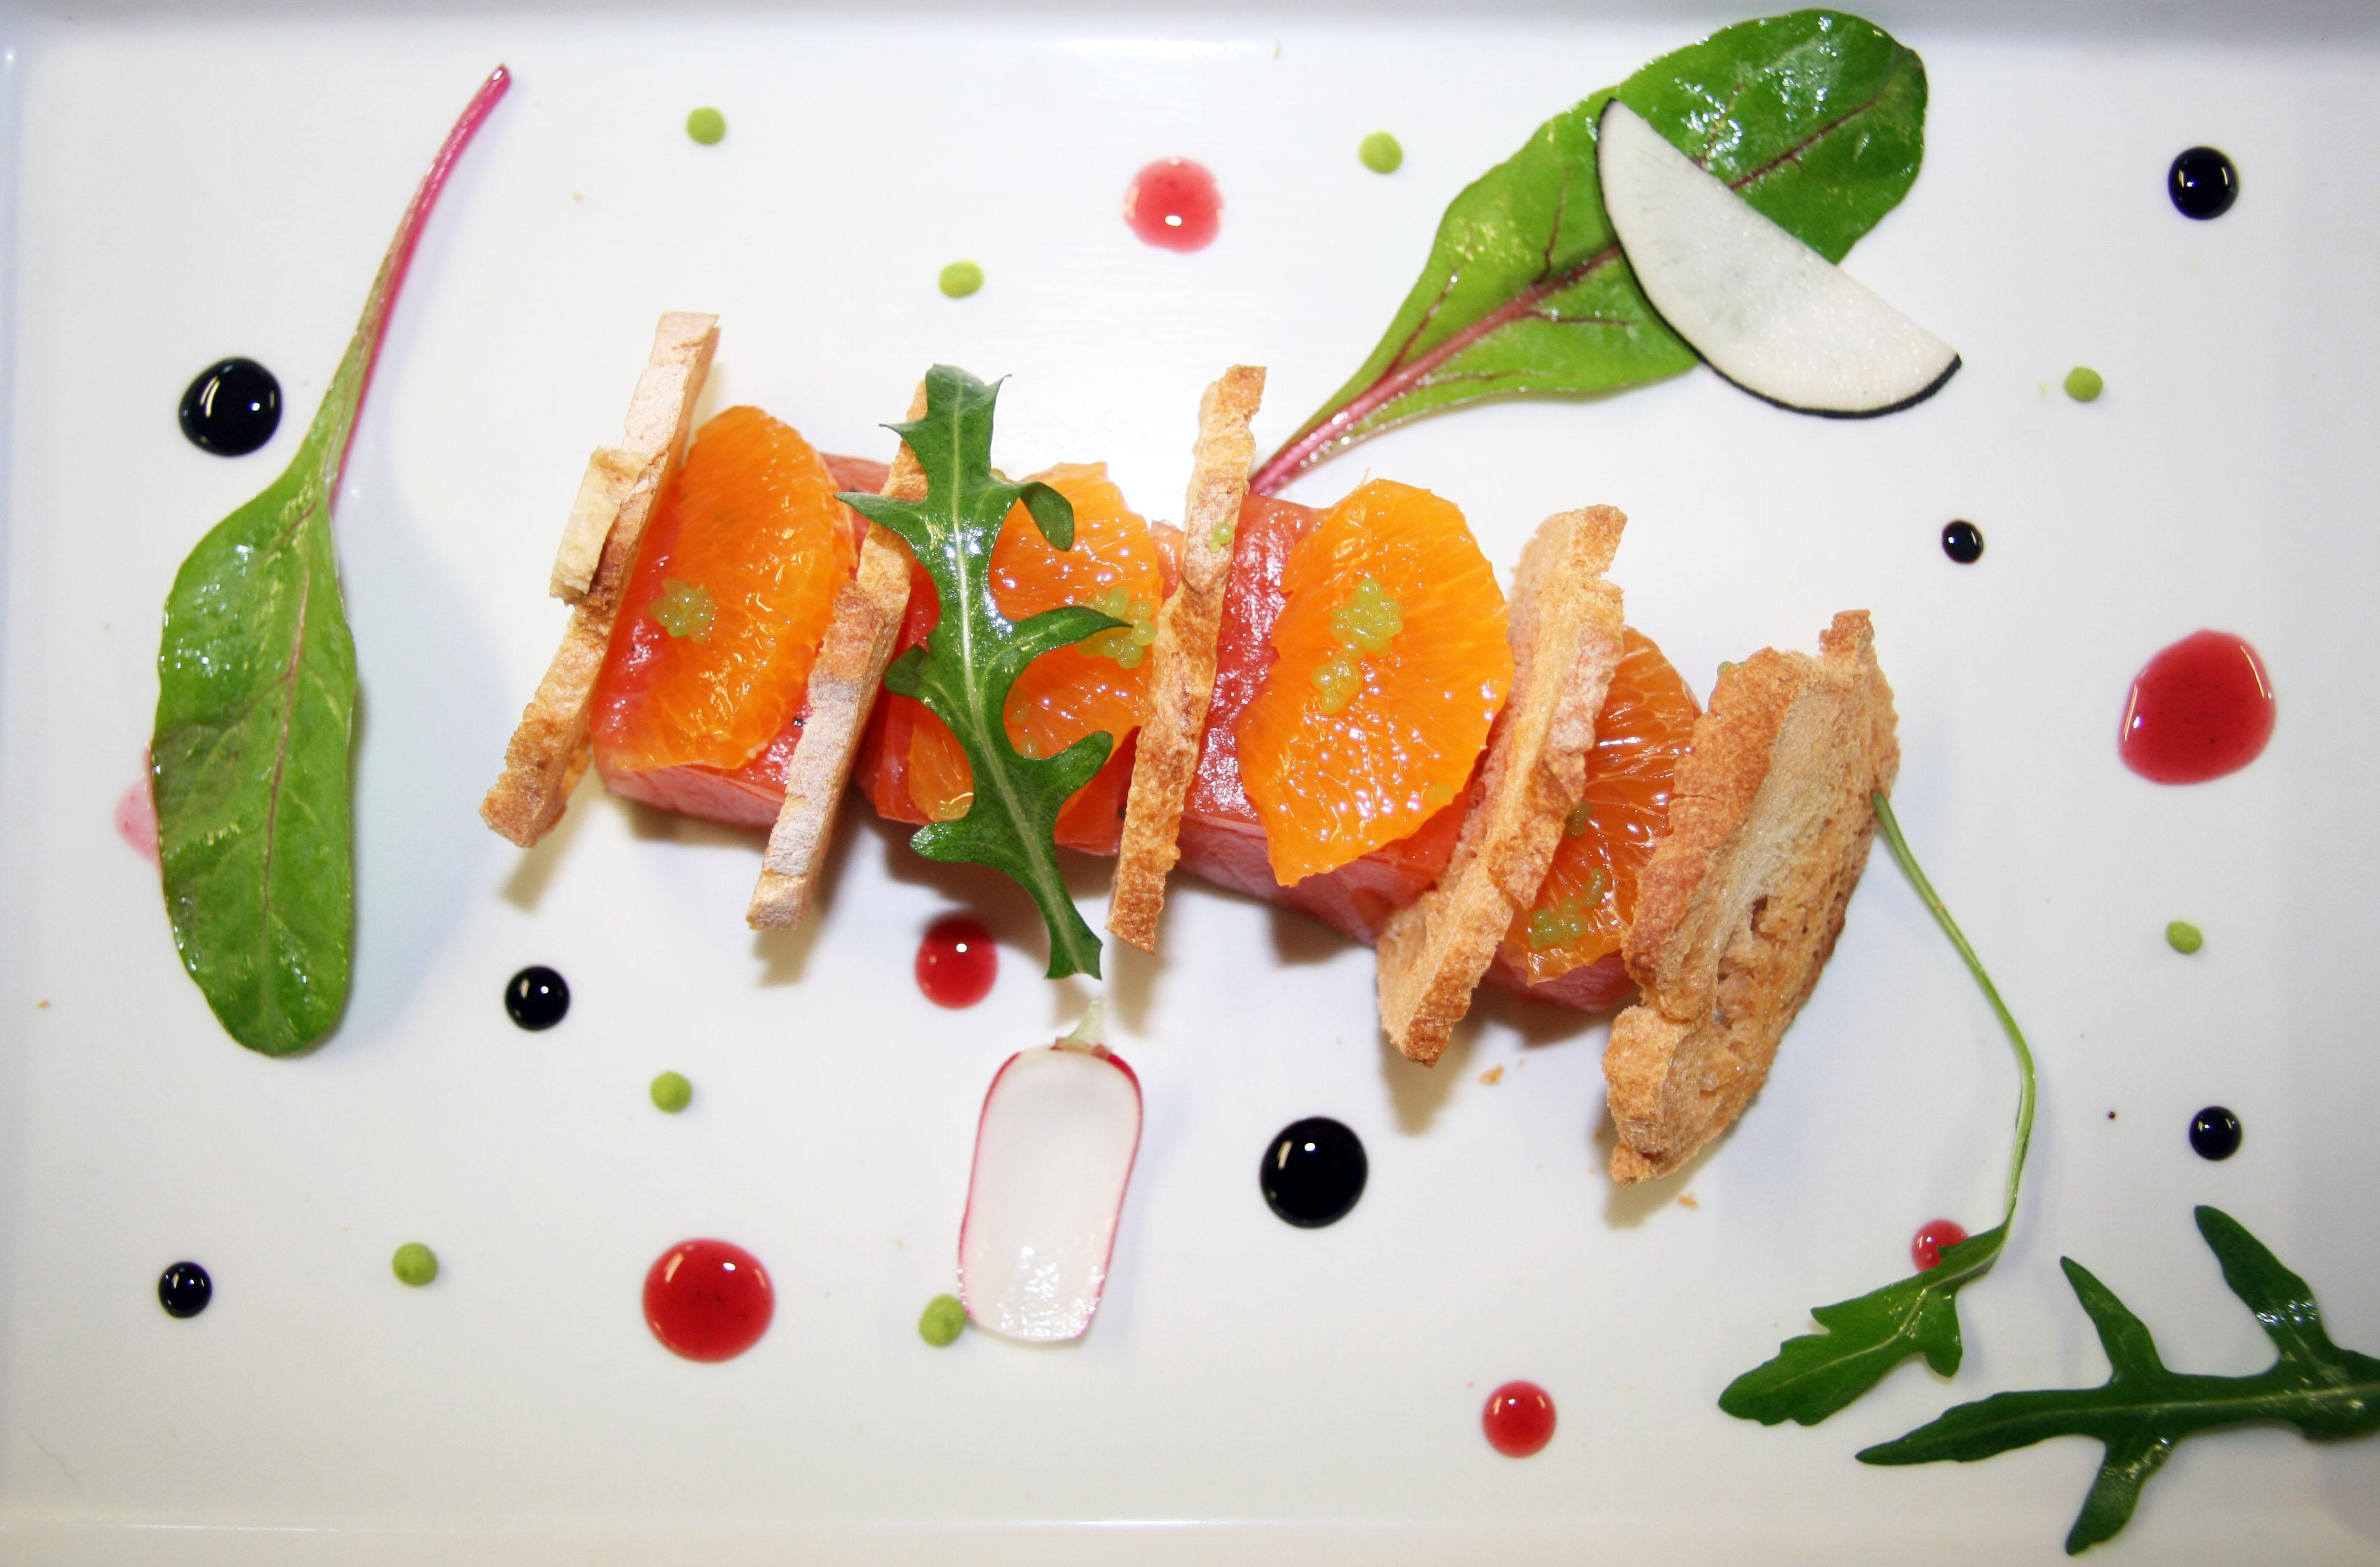 Top 8 Mediterranean food in Trets, France